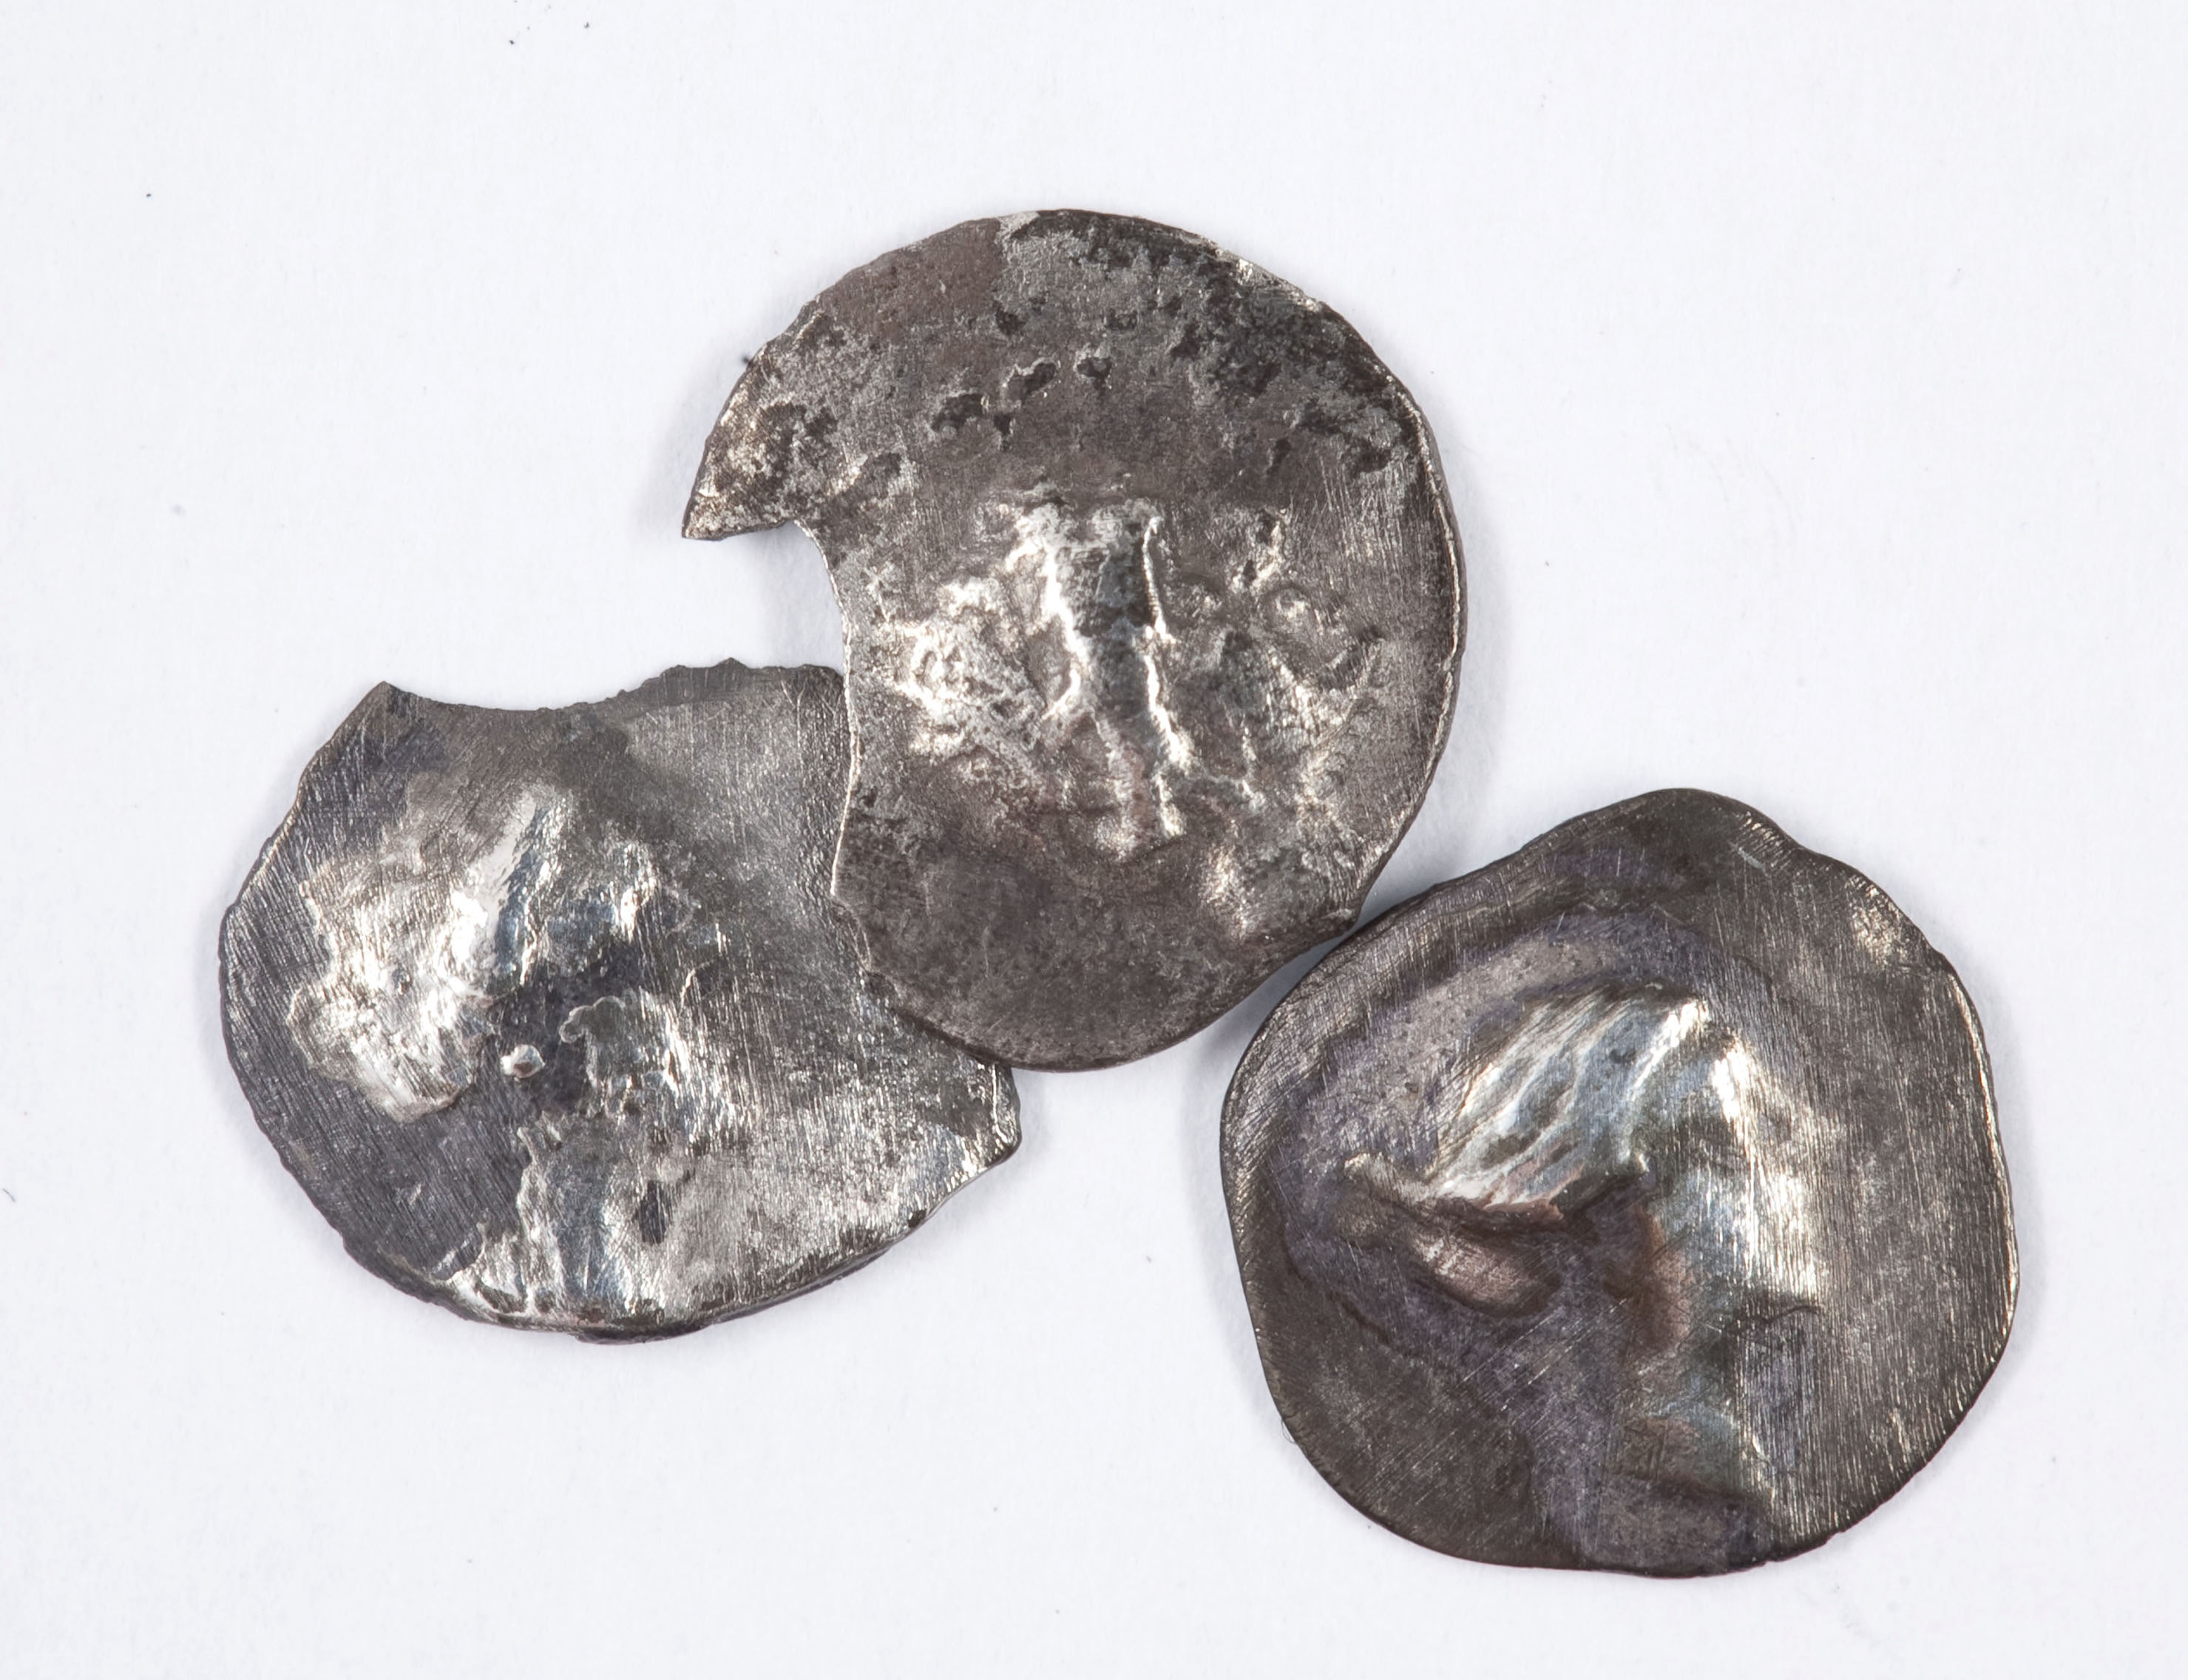 Emporion - Troballa de la necròpolis de les Corts d'Emporion - Final segle III aC